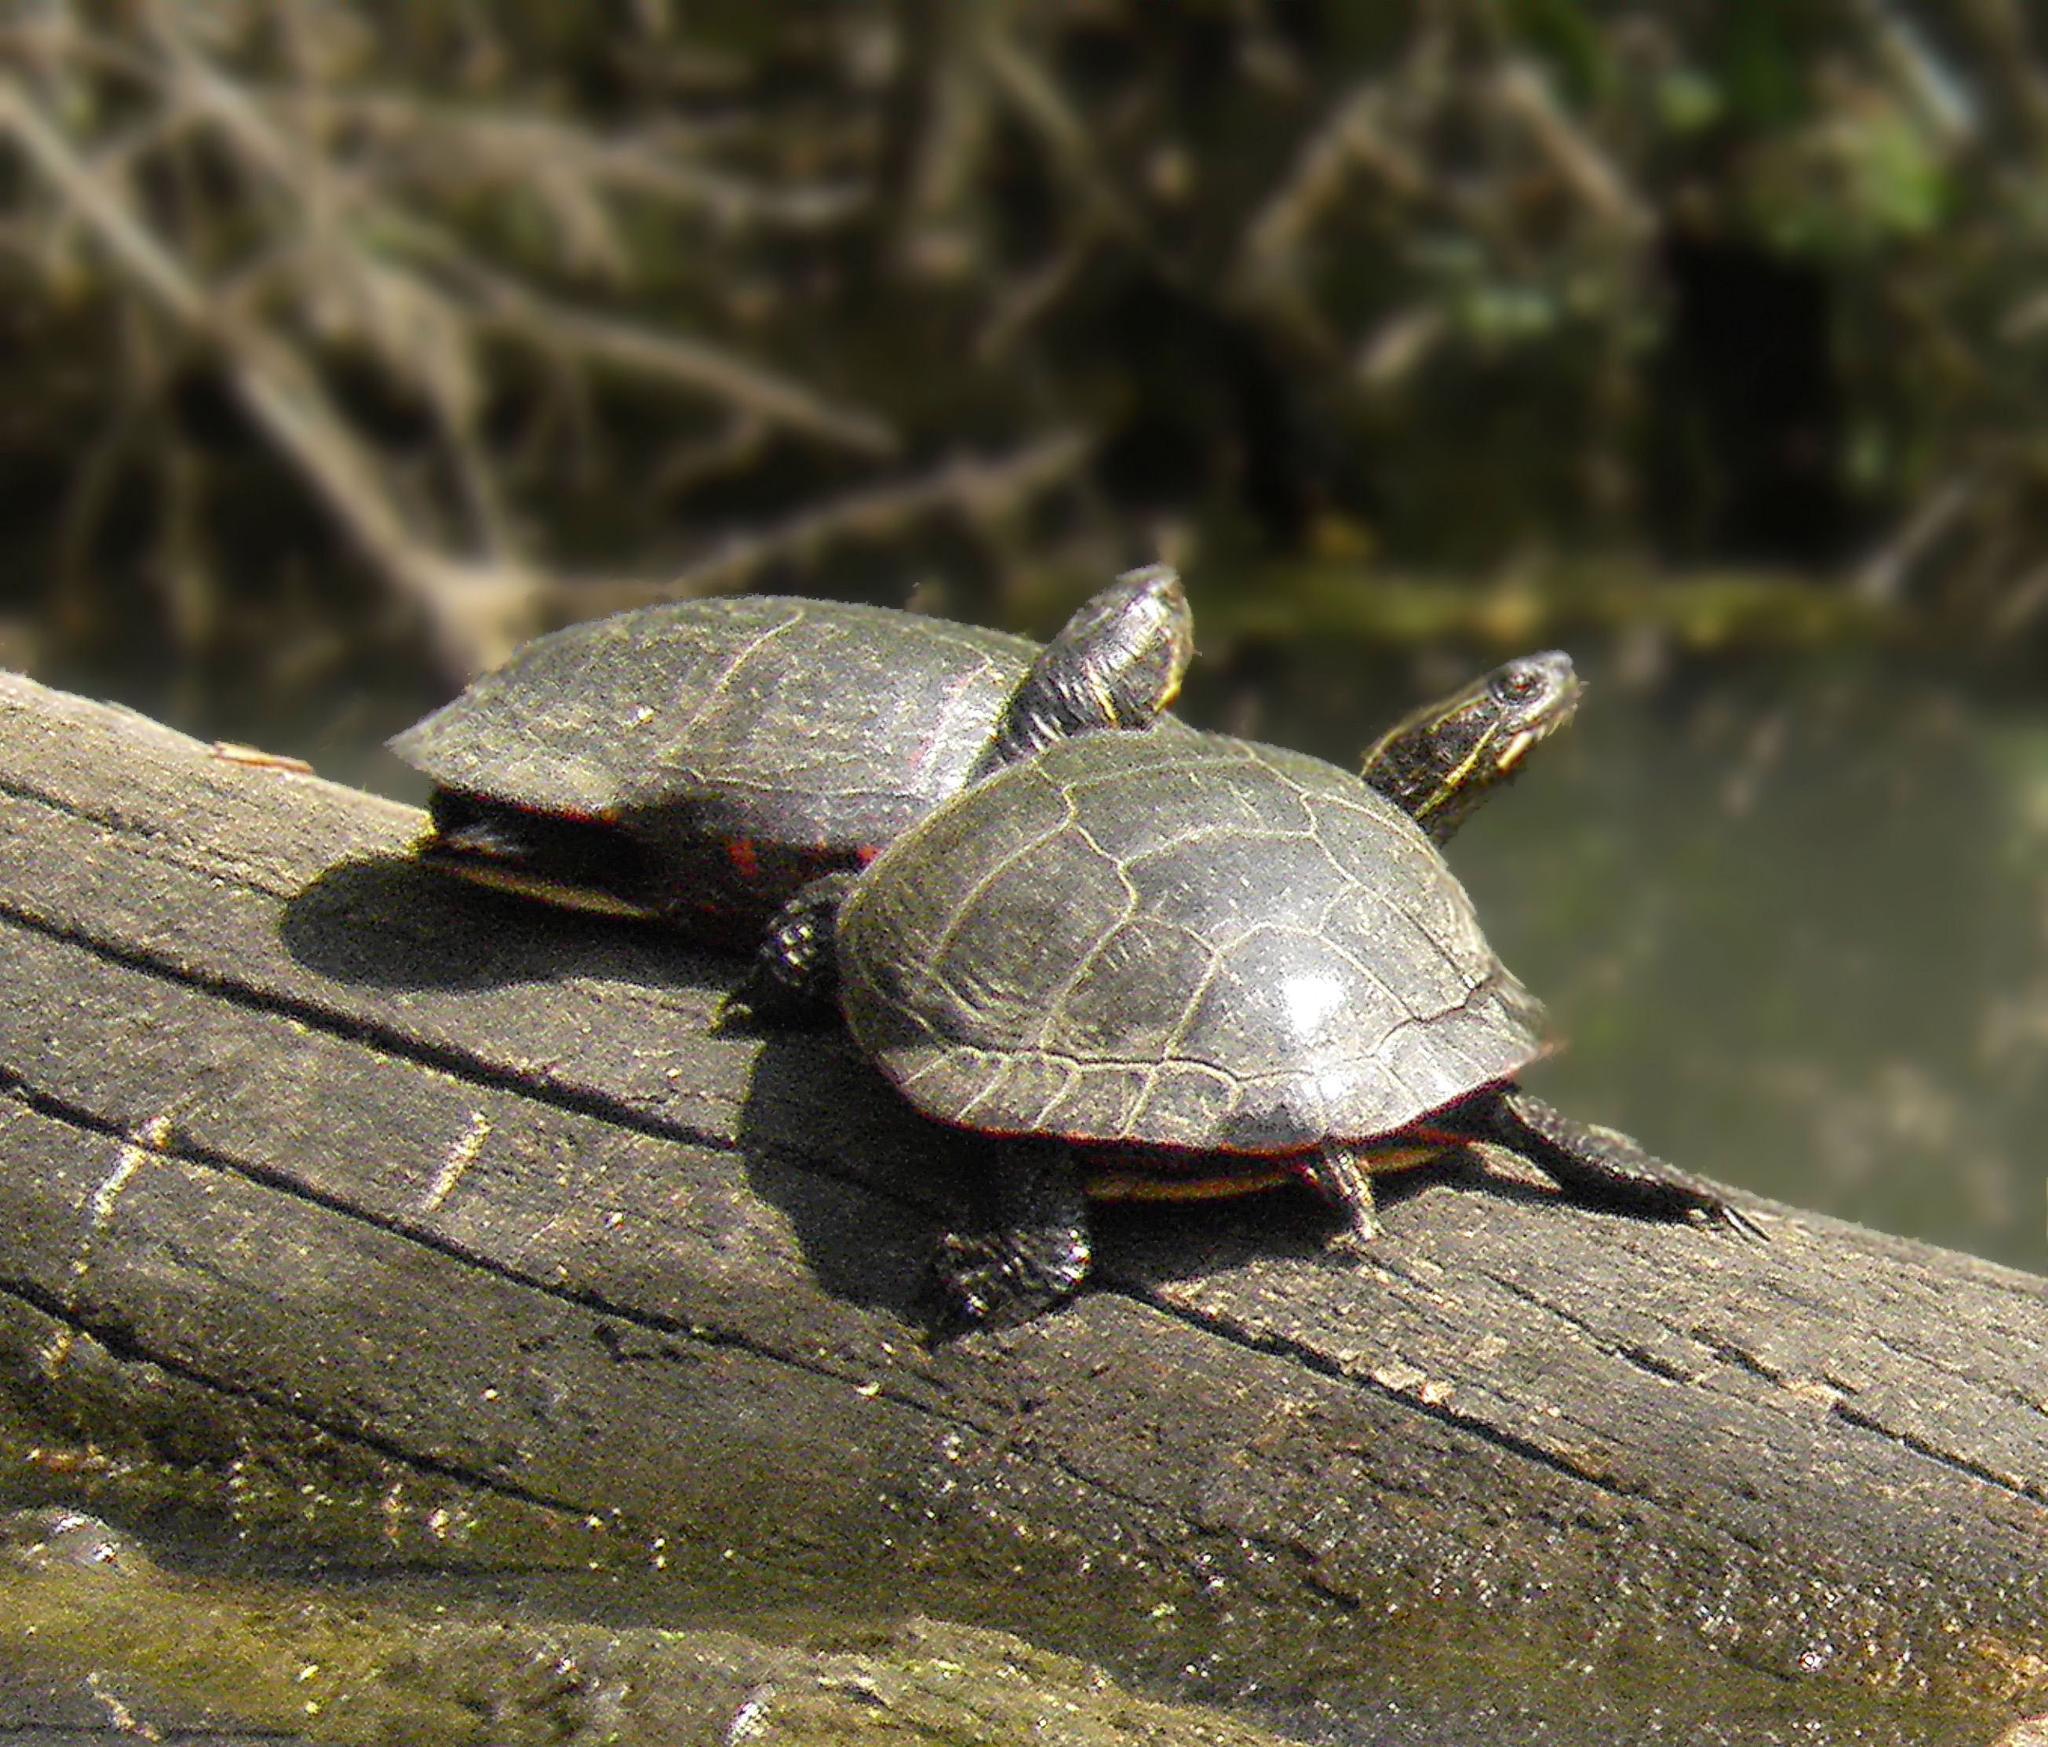 Turtles by Darlene Eastin